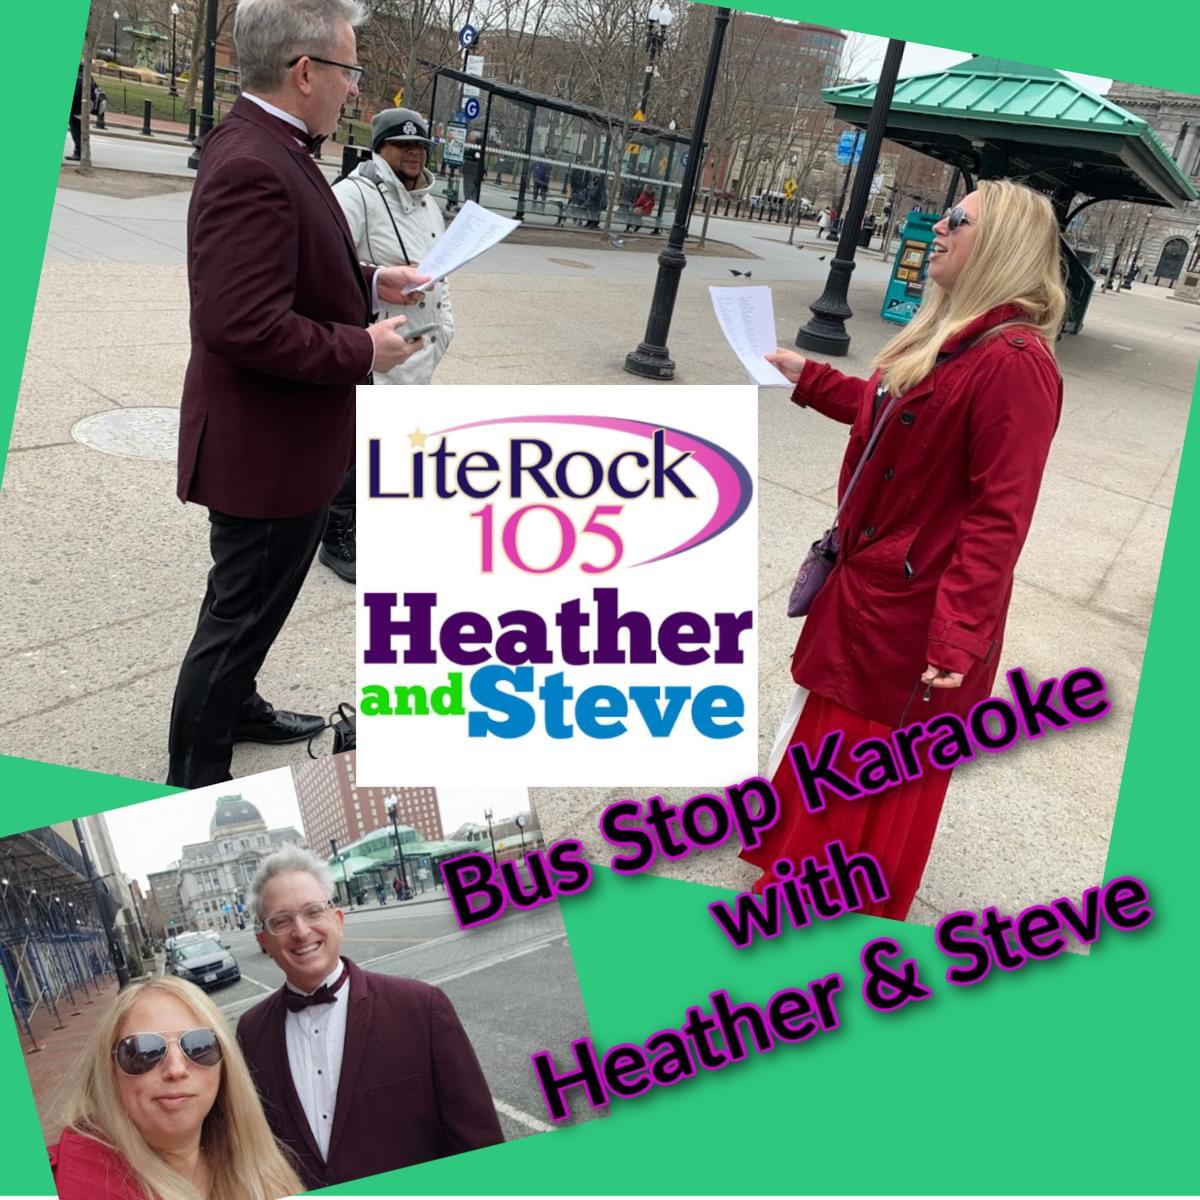 Heather & Steve's Bus Stop Karaoke